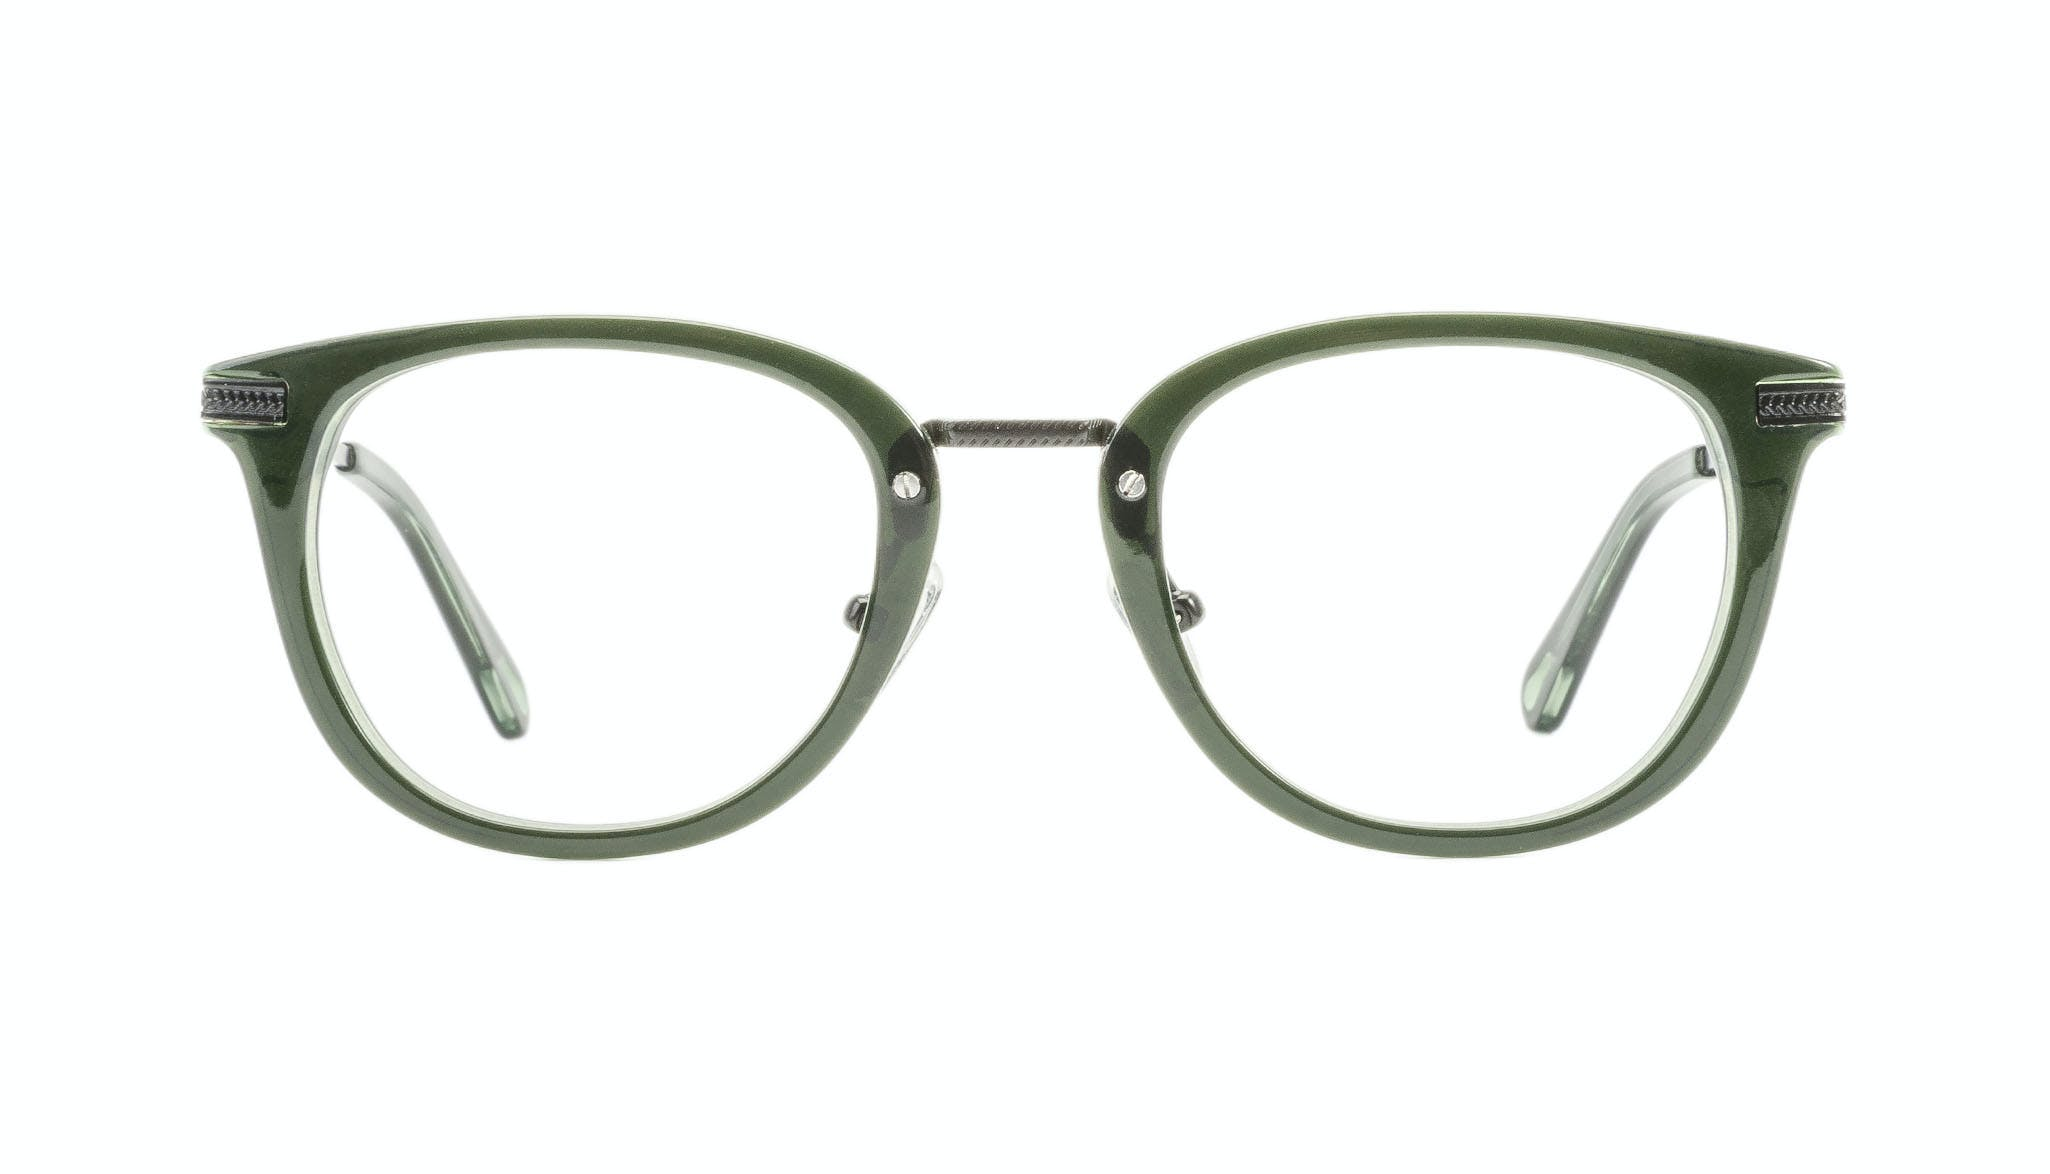 Affordable Fashion Glasses Rectangle Square Eyeglasses Men Street Soul Olive